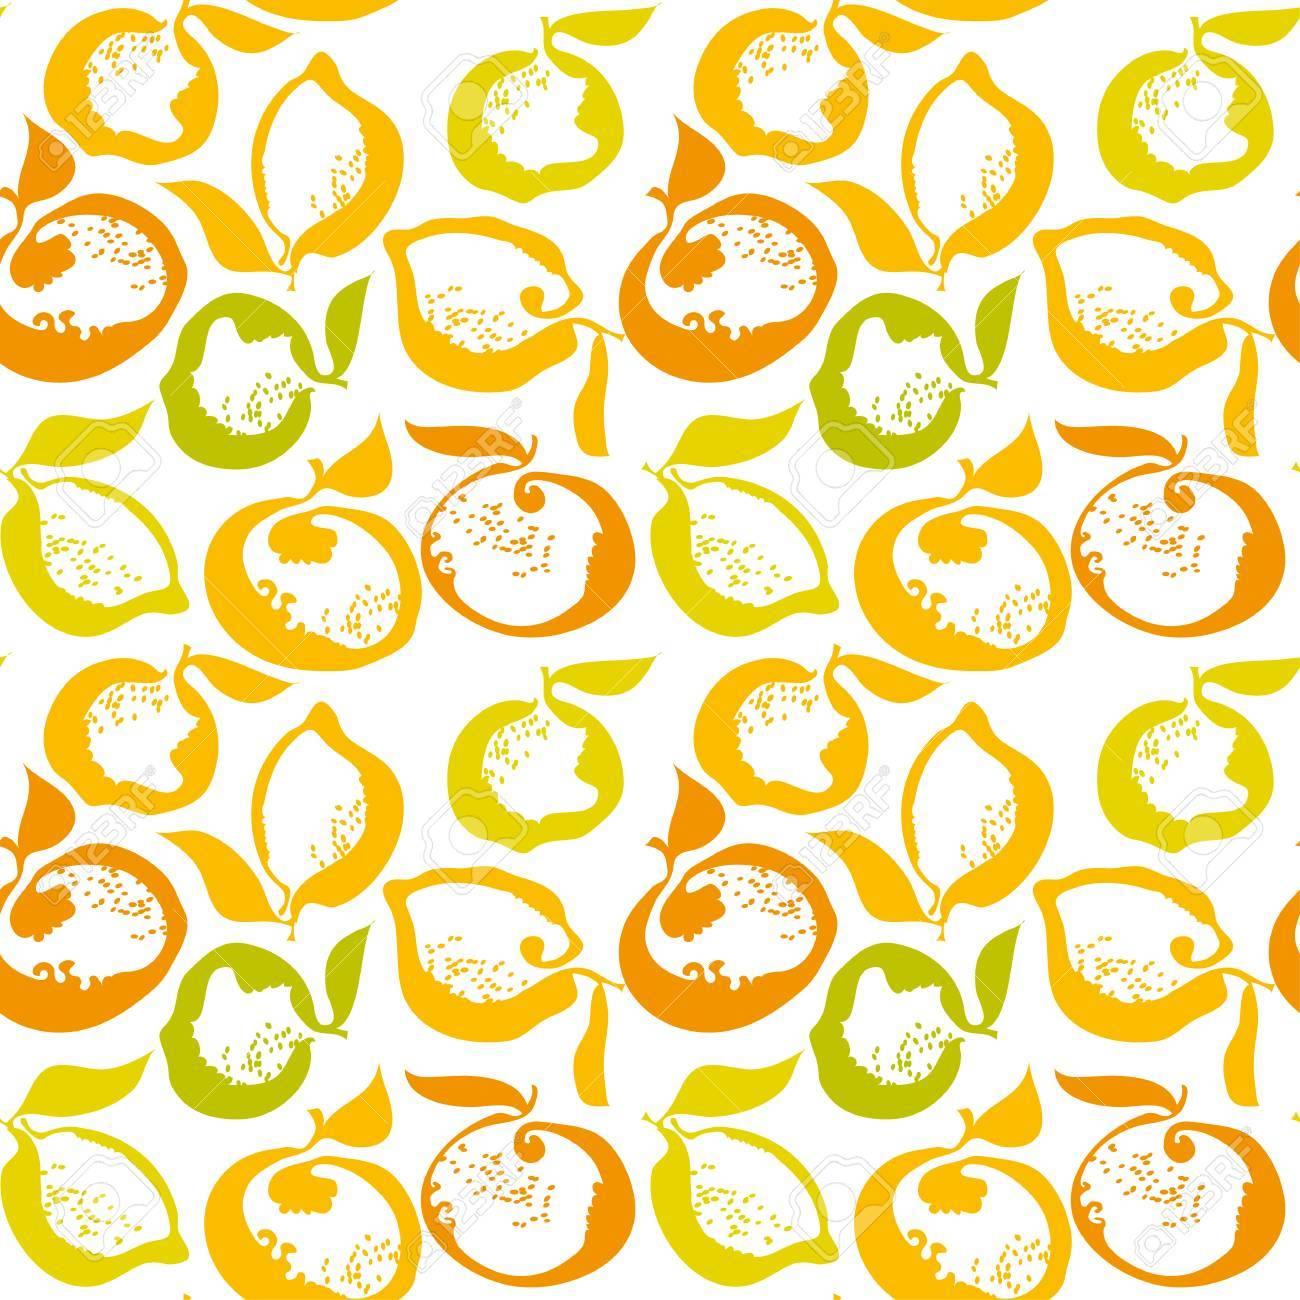 citrus fruit lemon and orange decorative pattern. vector illustration - 81578740